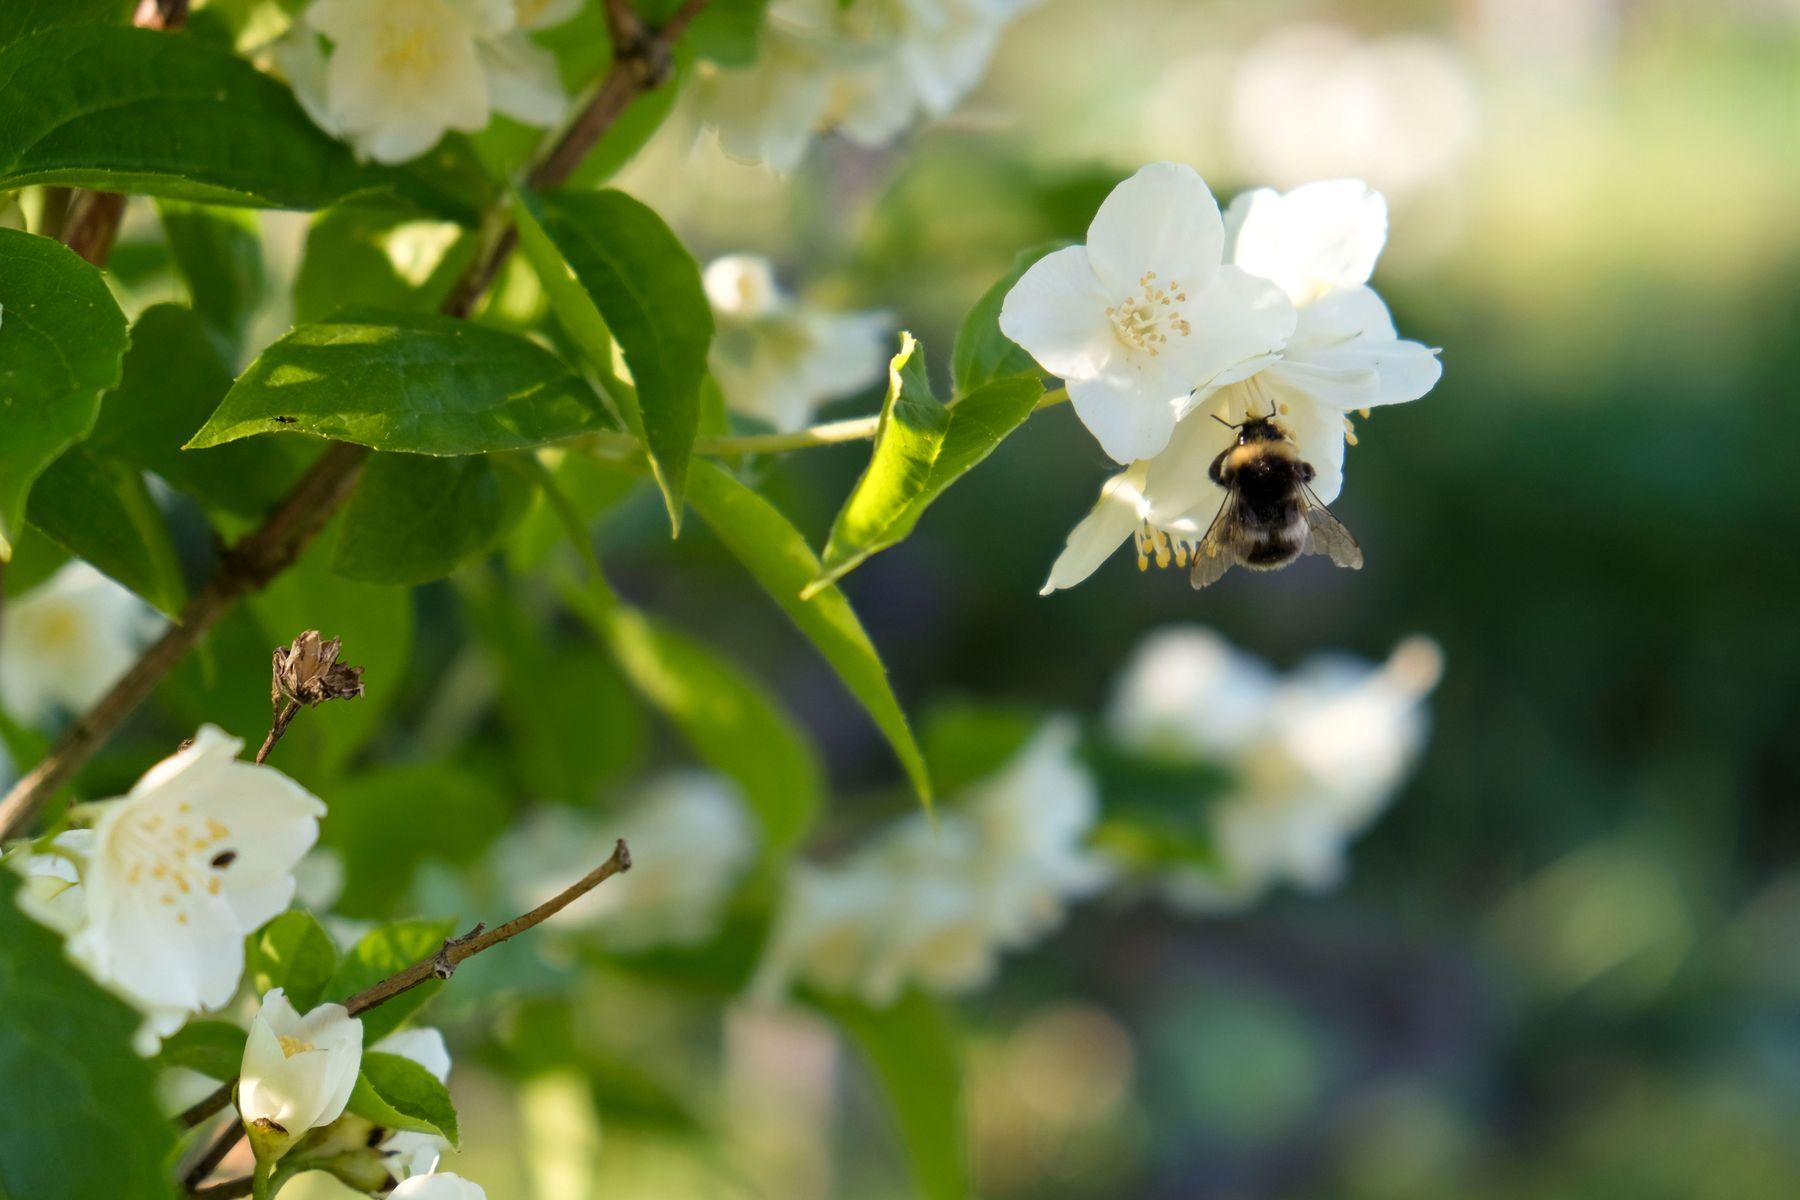 Шмель на цветке жасмина.